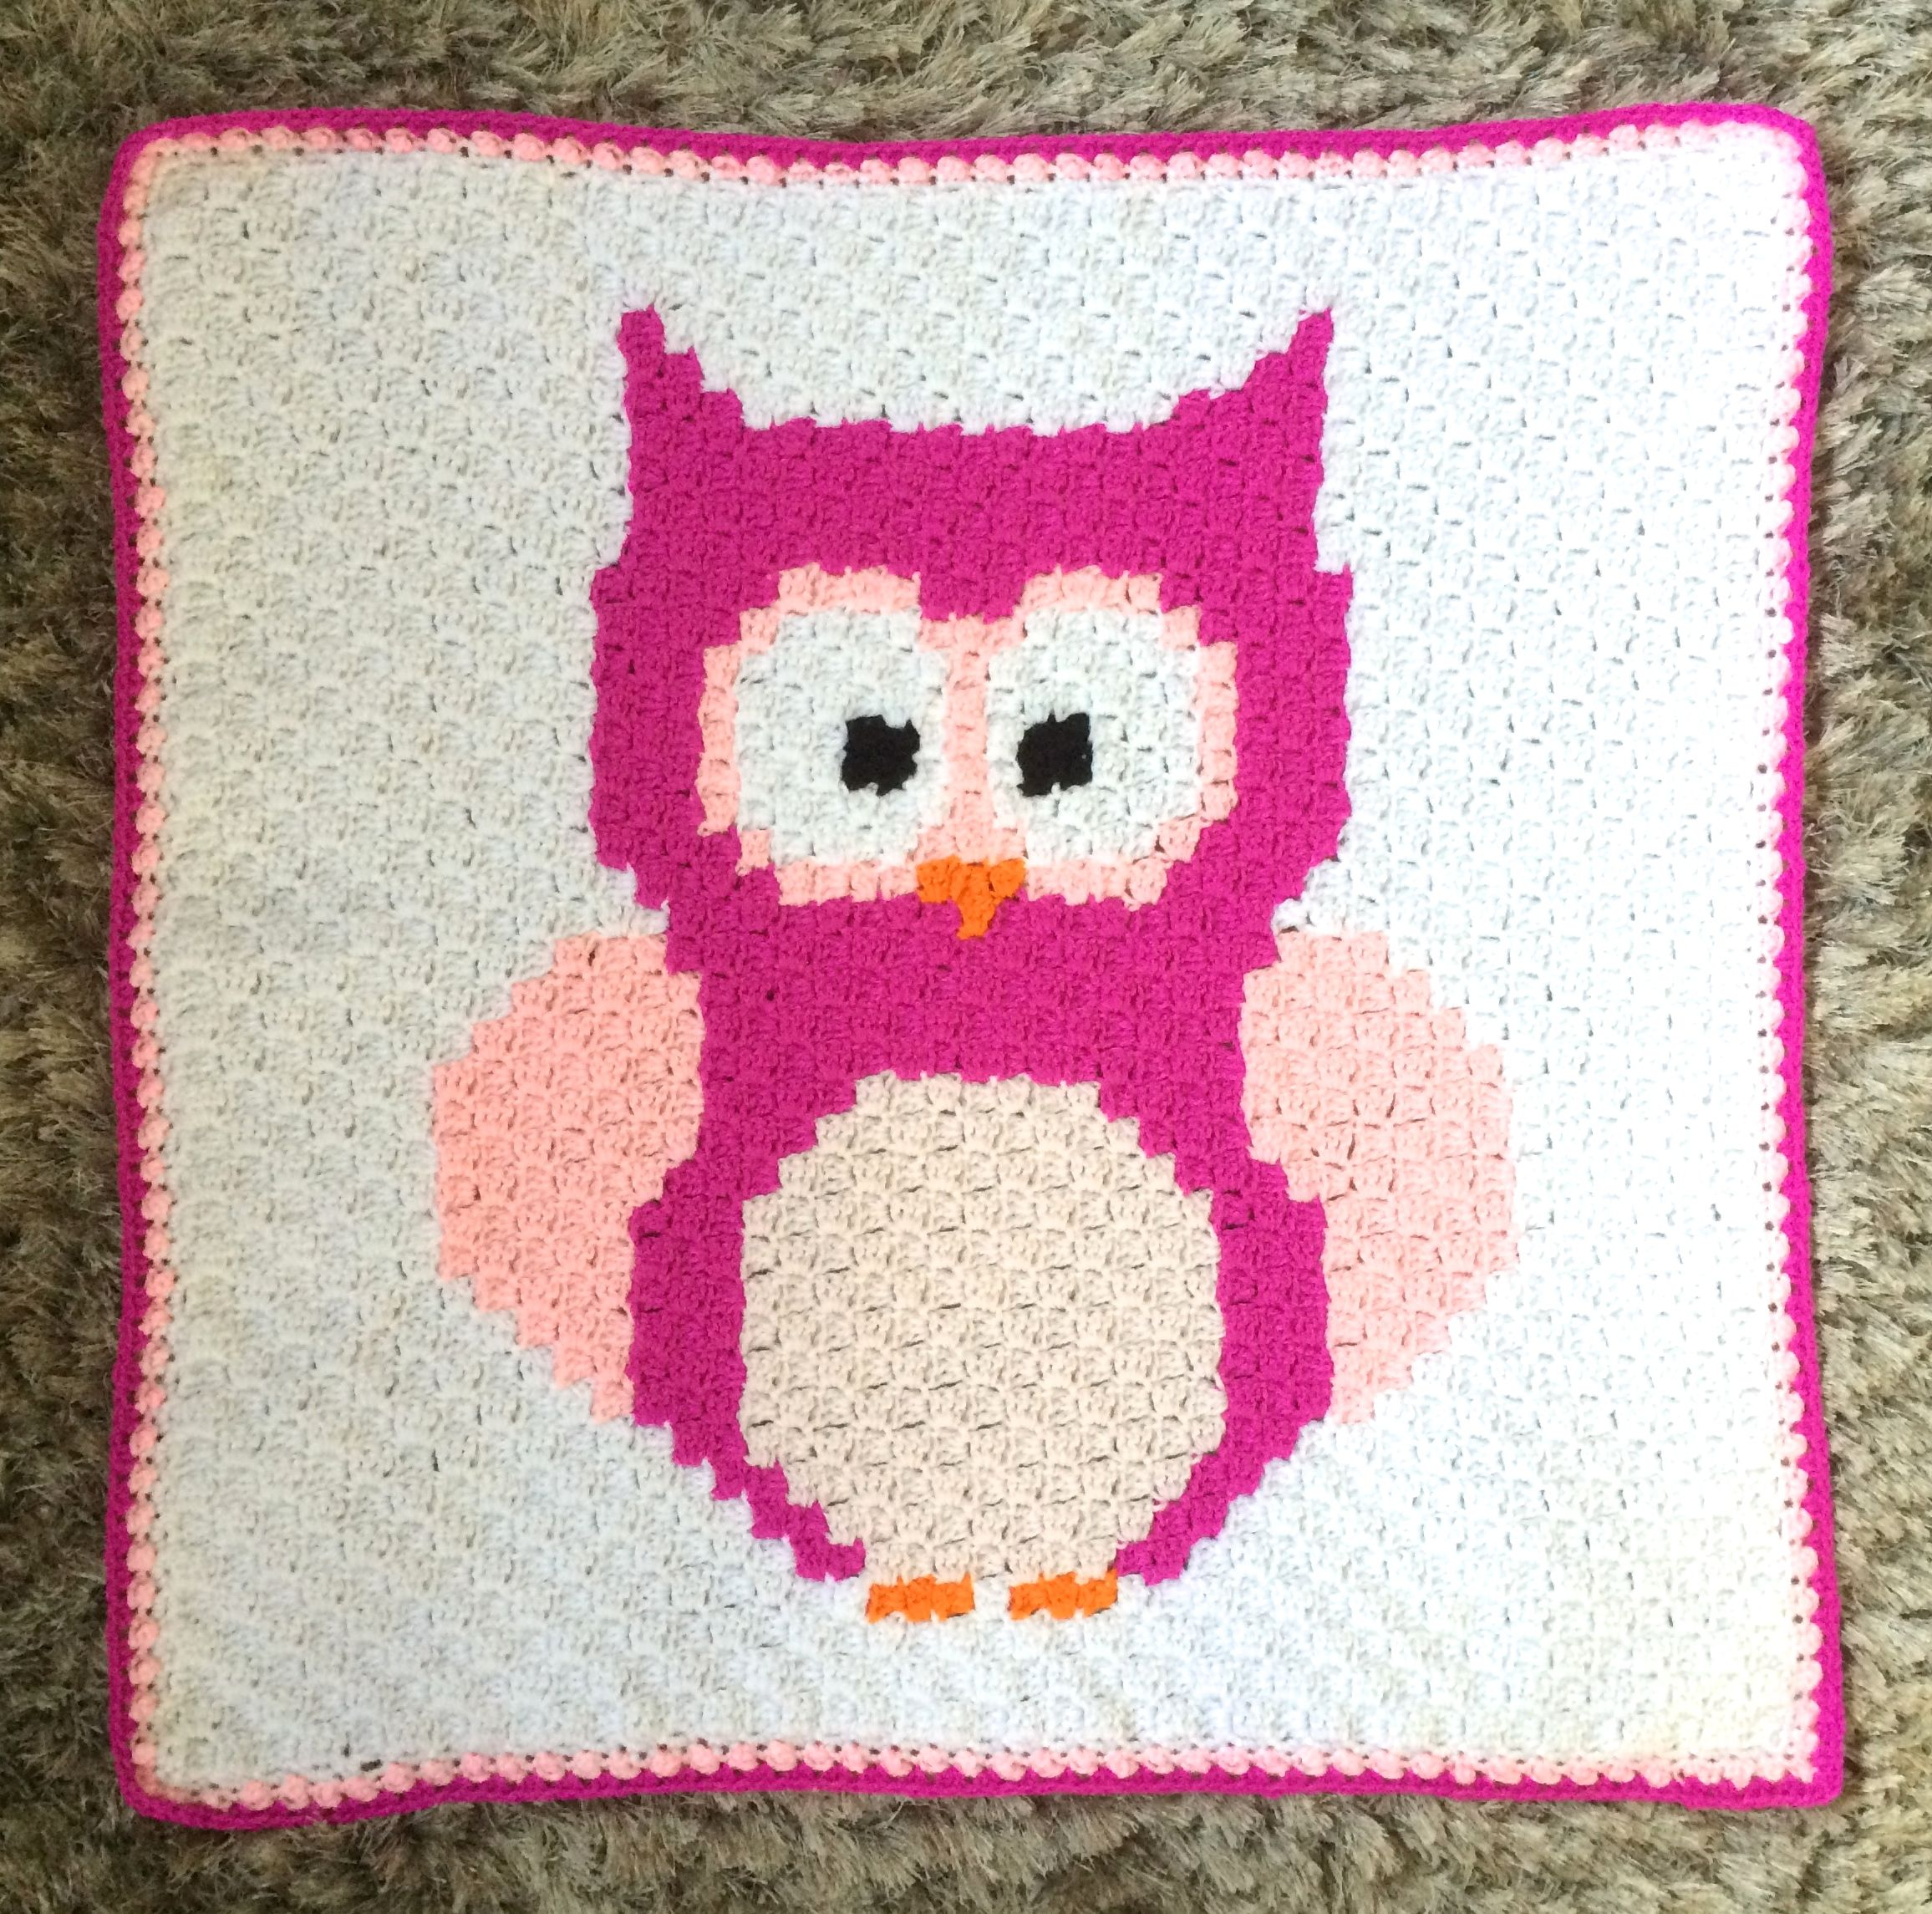 Handmade crochet owl blanket pattern by sarah zimmerman crochet handmade crochet owl blanket pattern by sarah zimmerman bankloansurffo Image collections